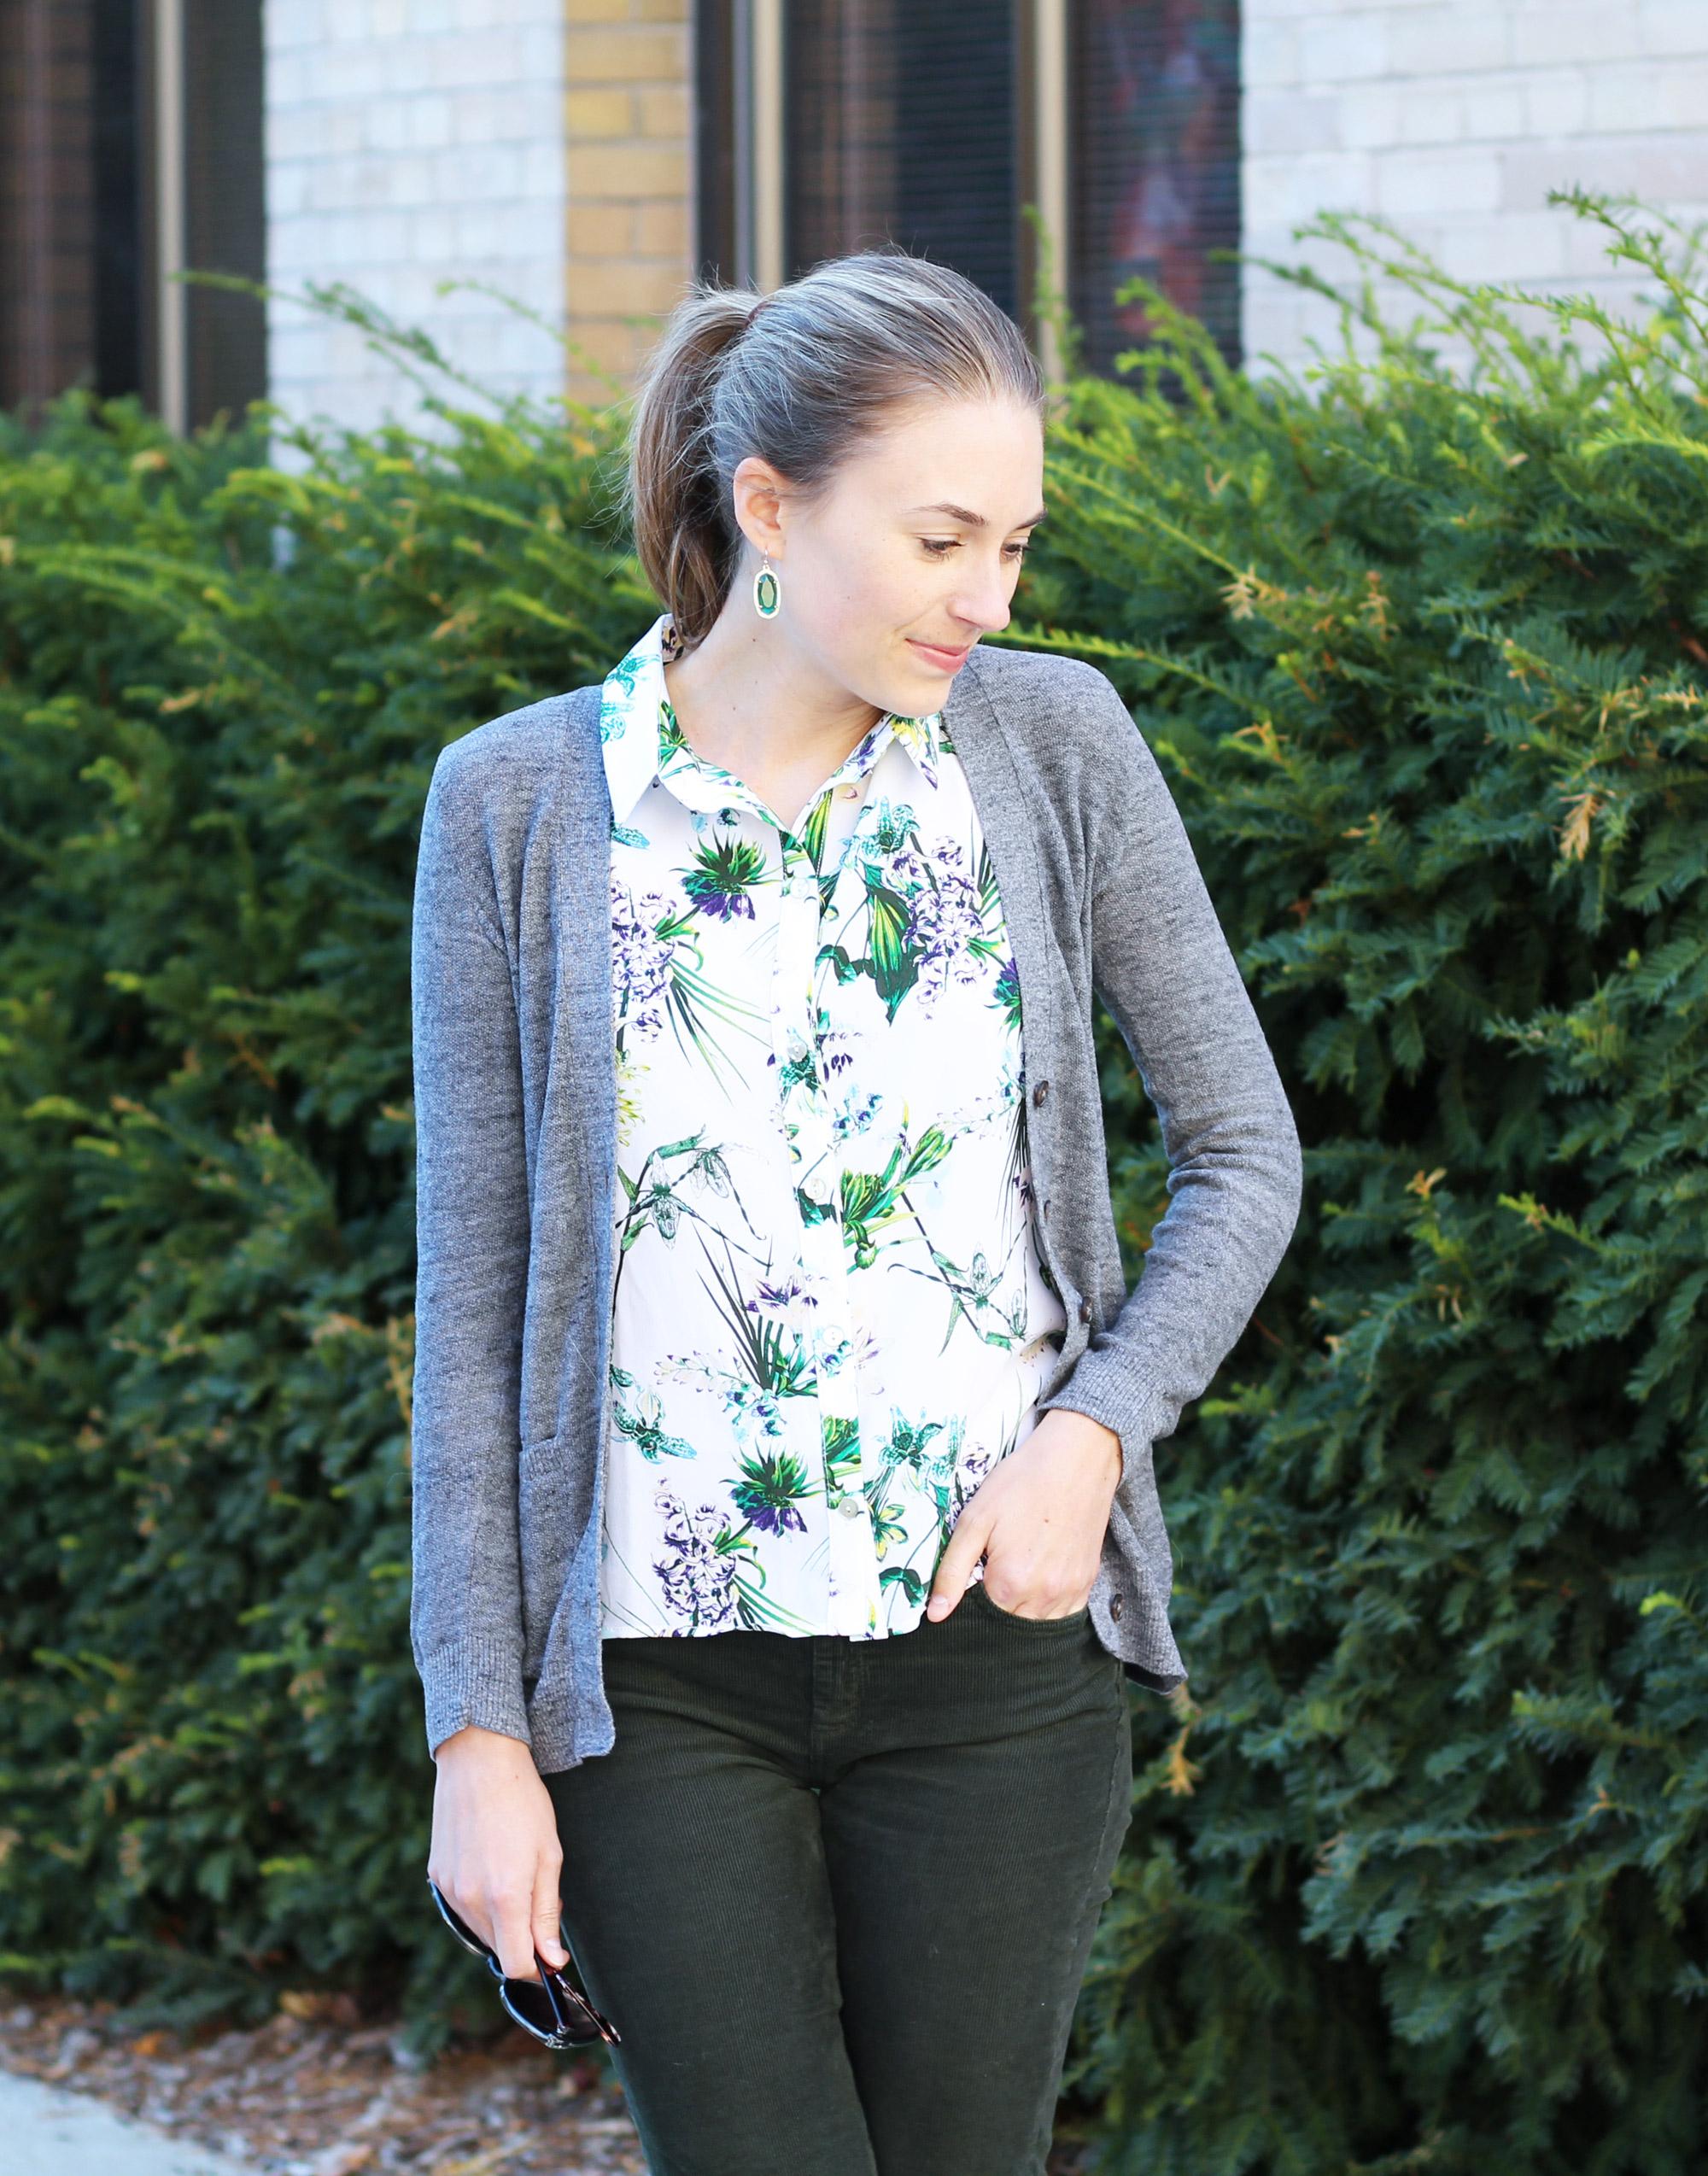 Tropical-print silk shirt with grey cardigan, green corduroy pants, Kendra Scott earrings — Cotton Cashmere Cat Hair